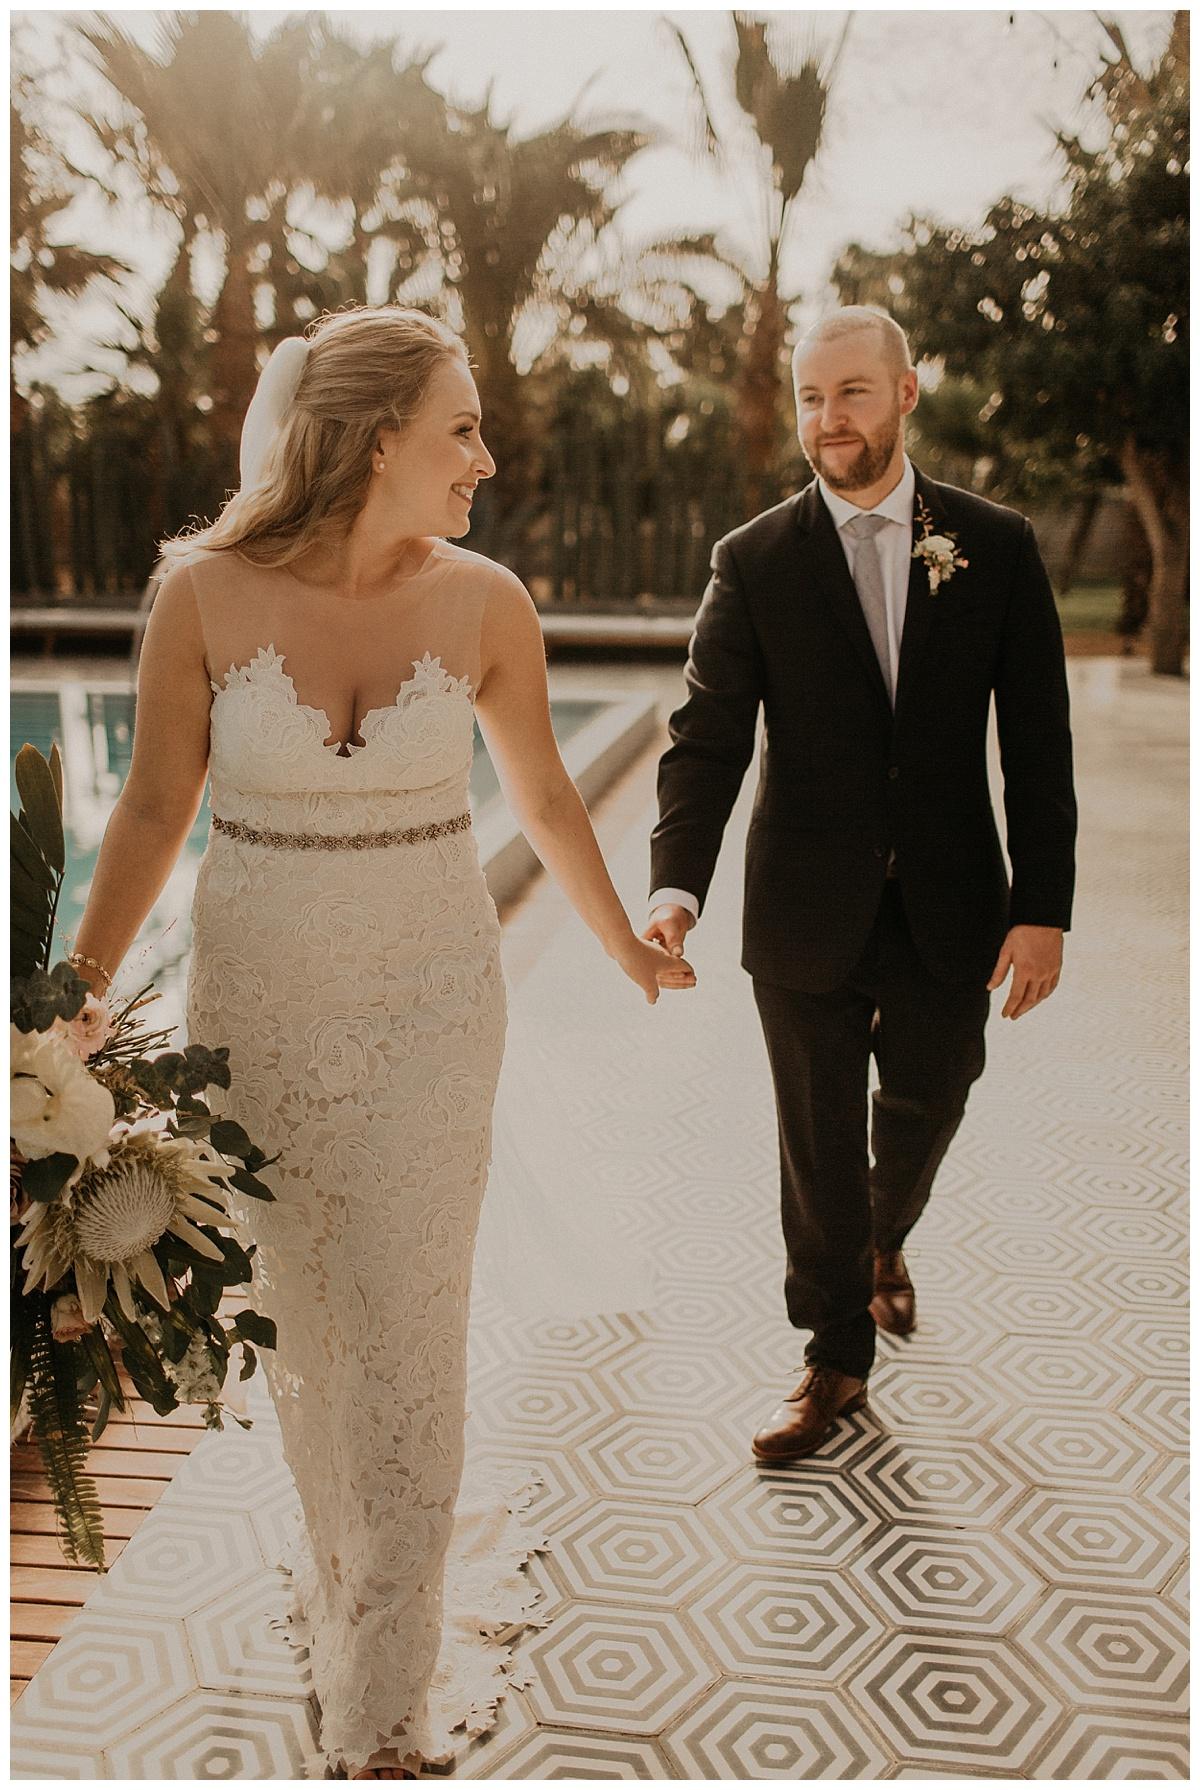 Bixby+Pine-PNW-Wedding-Planners-And-Designers_1780.jpg